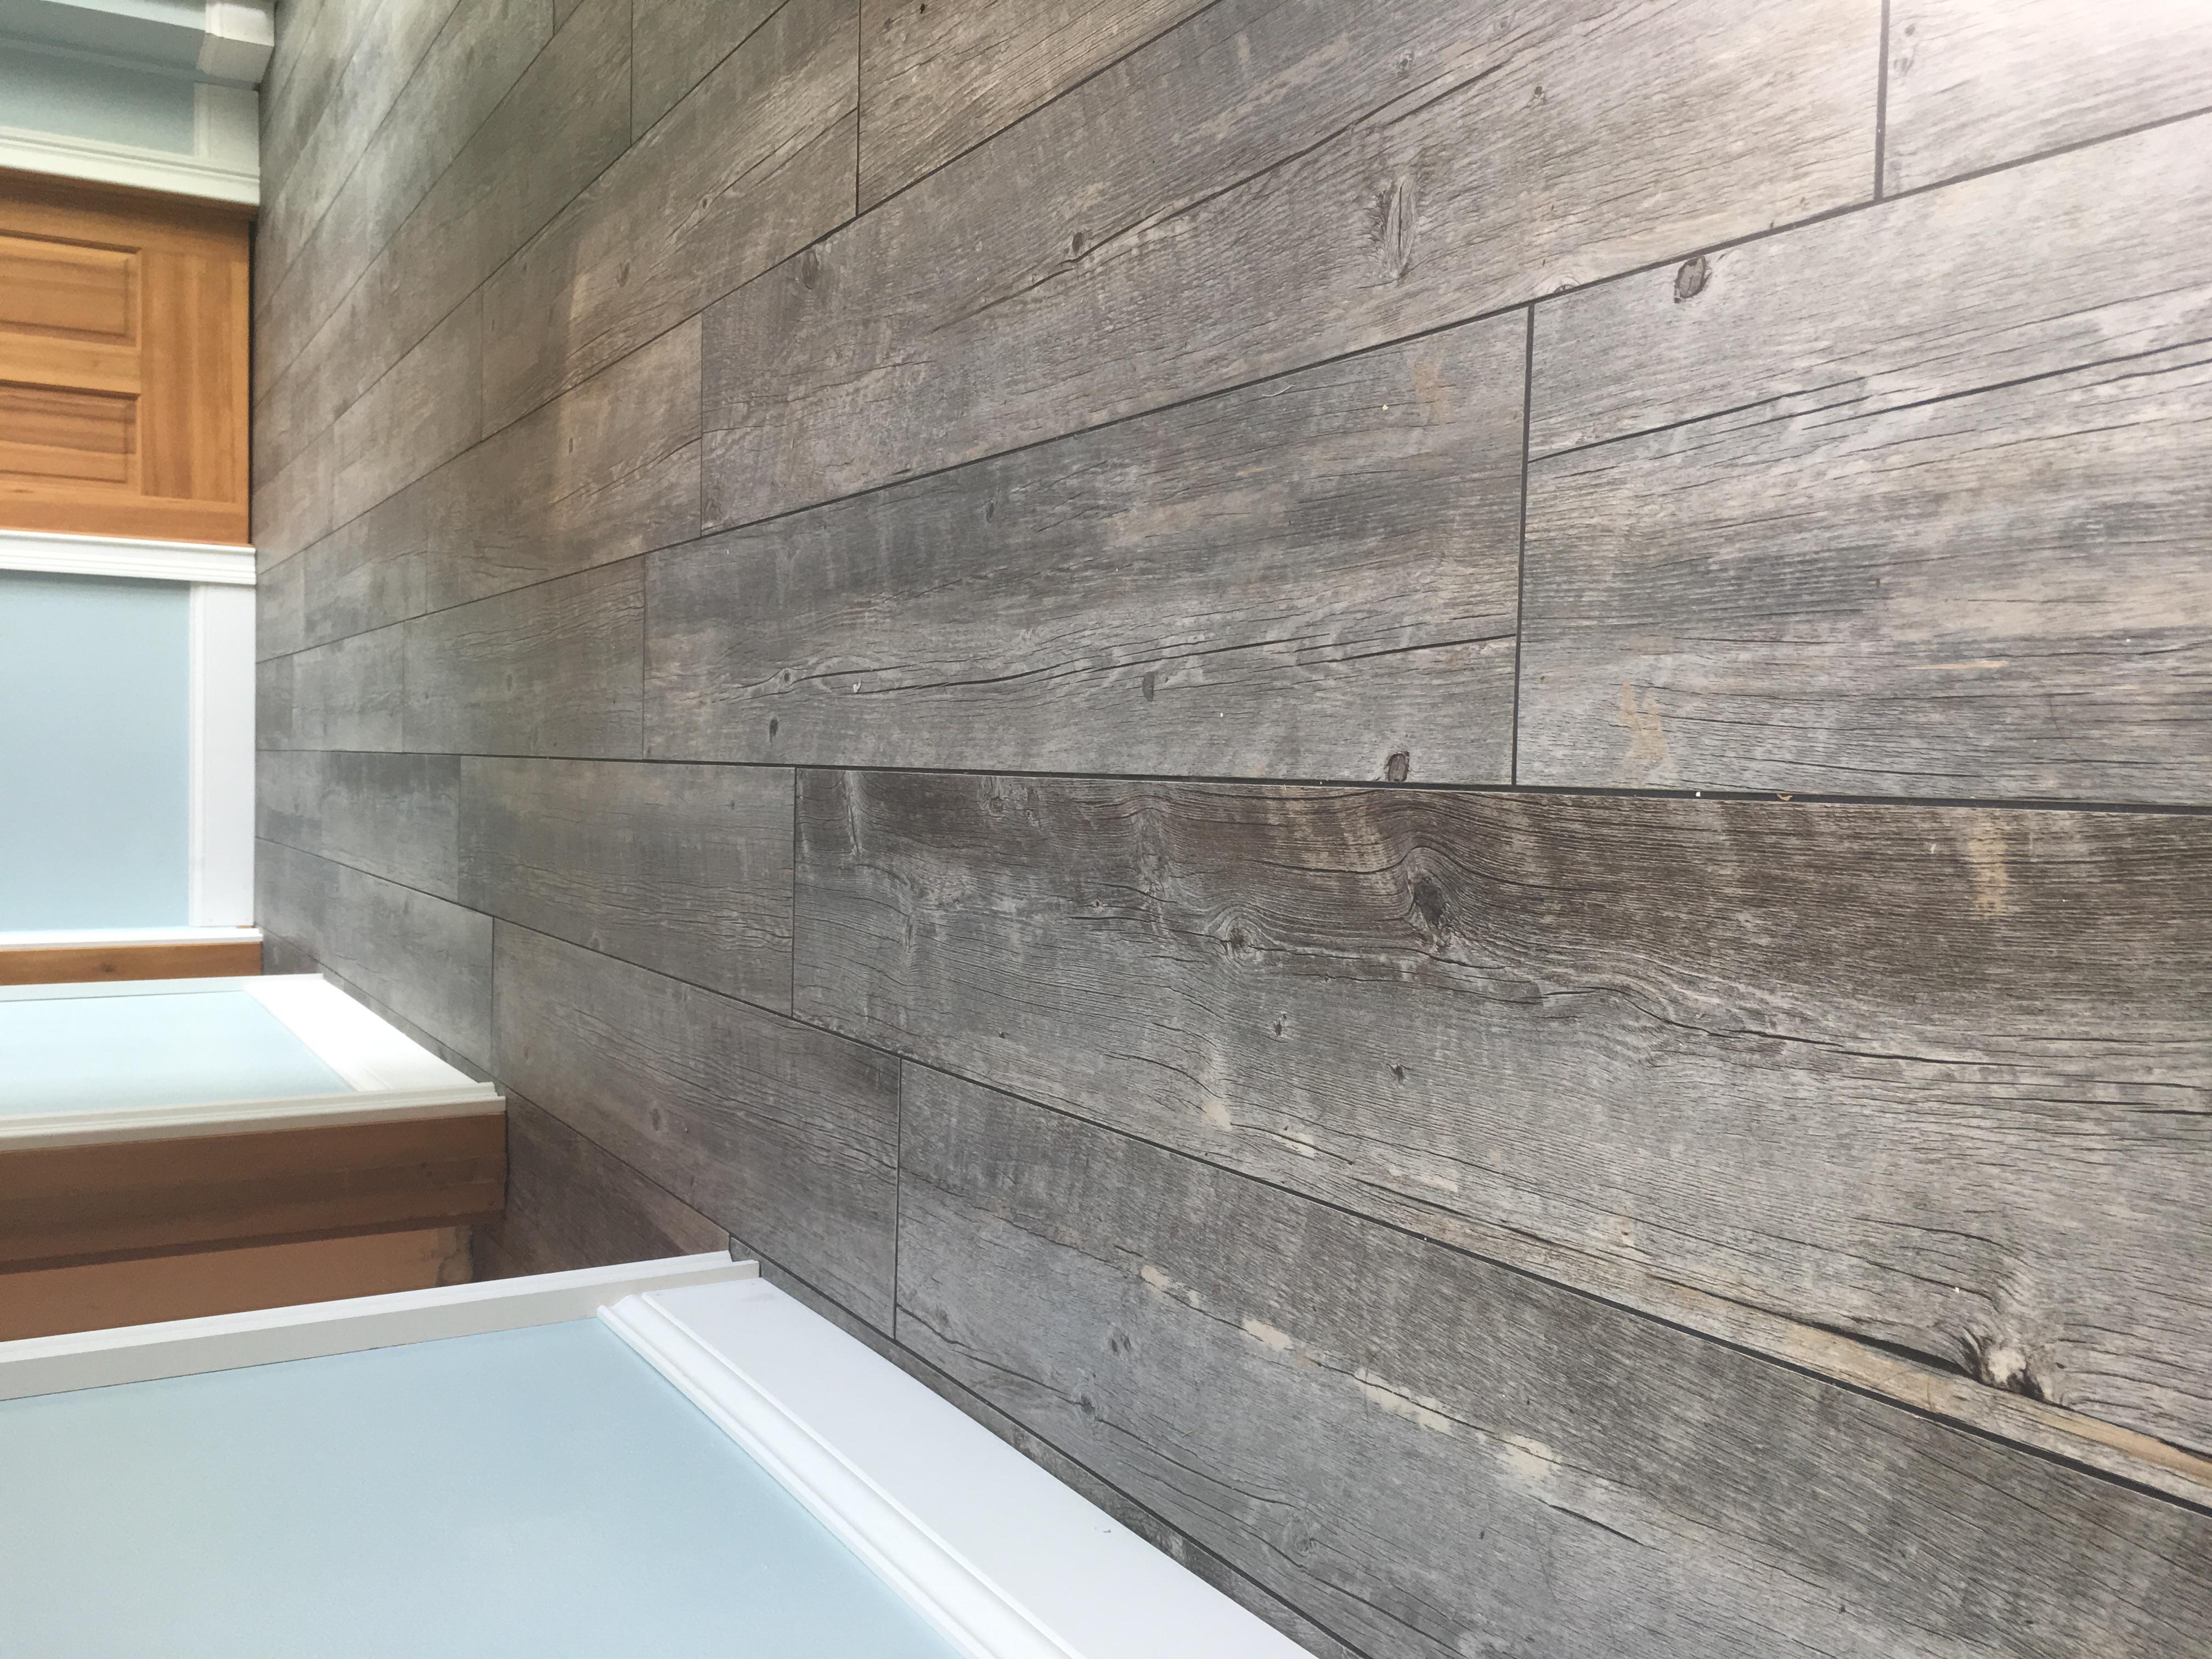 Wood Look Tile Installation